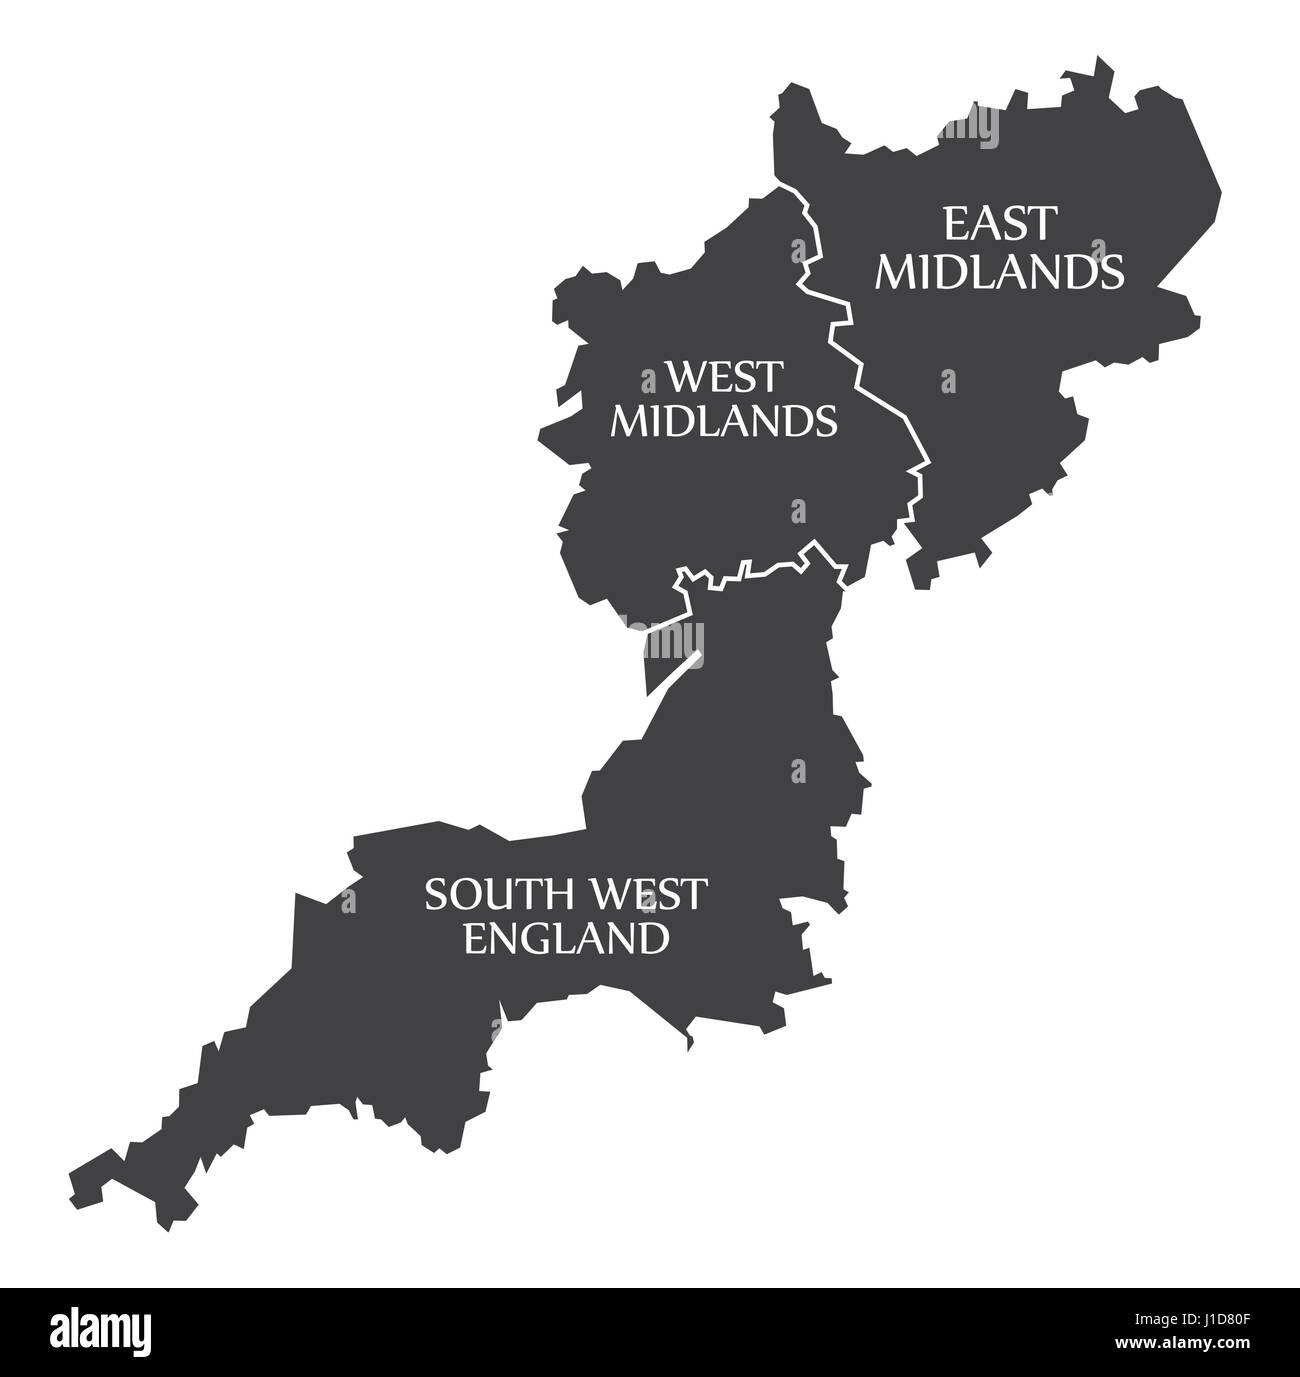 Map Of England Midlands.South West England West Midlands East Midlands Map Uk Stock